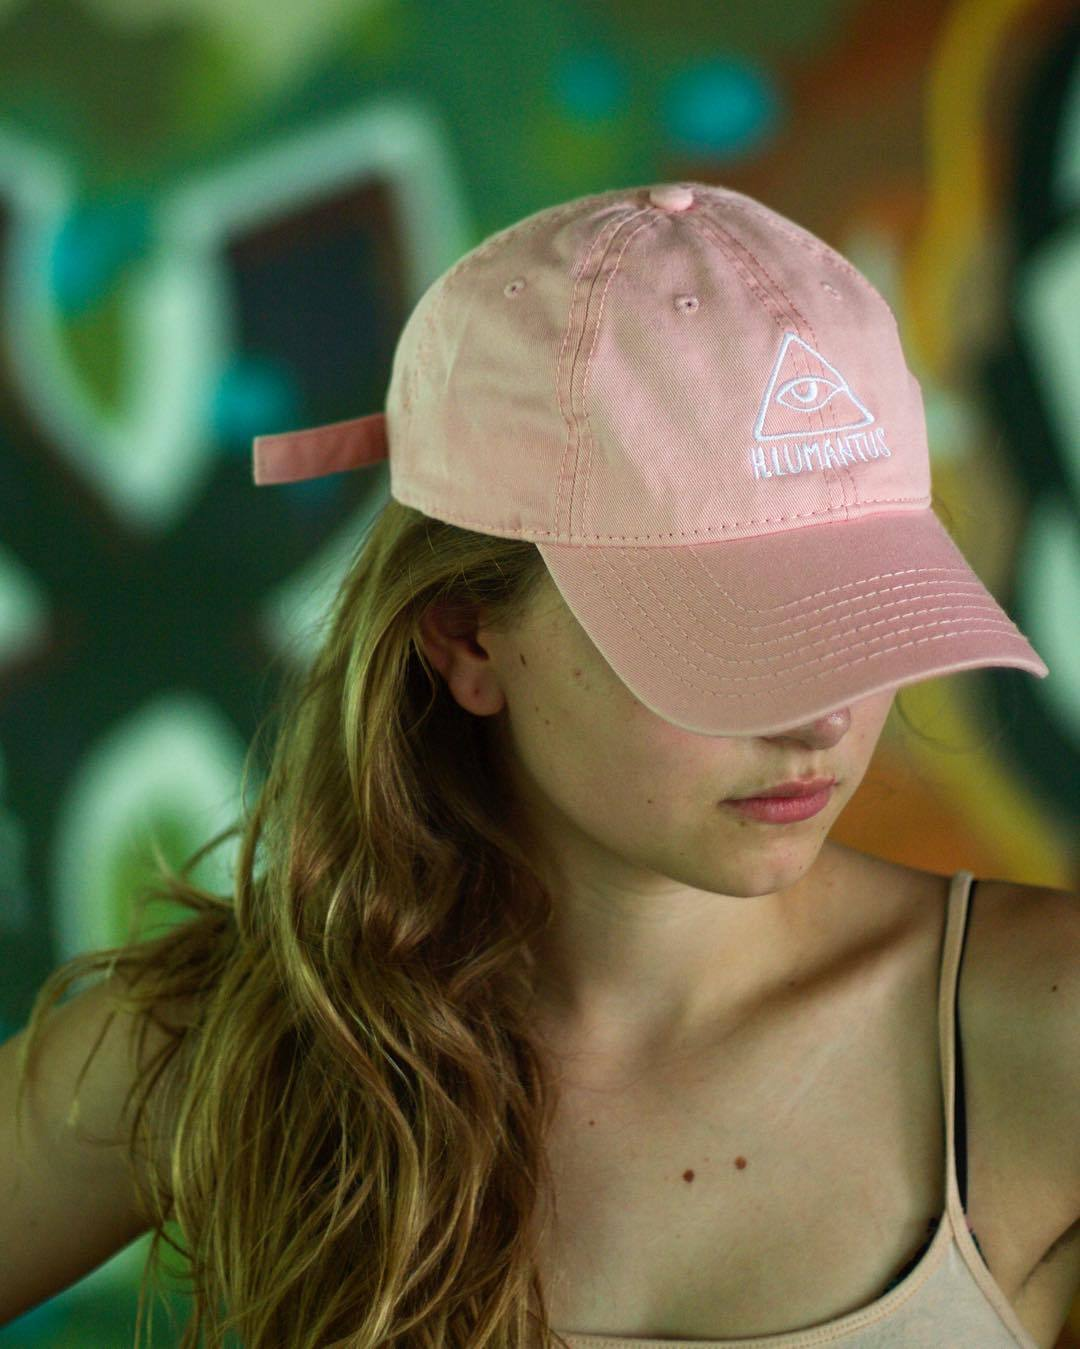 illuminatus hat available. link in bio. new new coming soon soon.